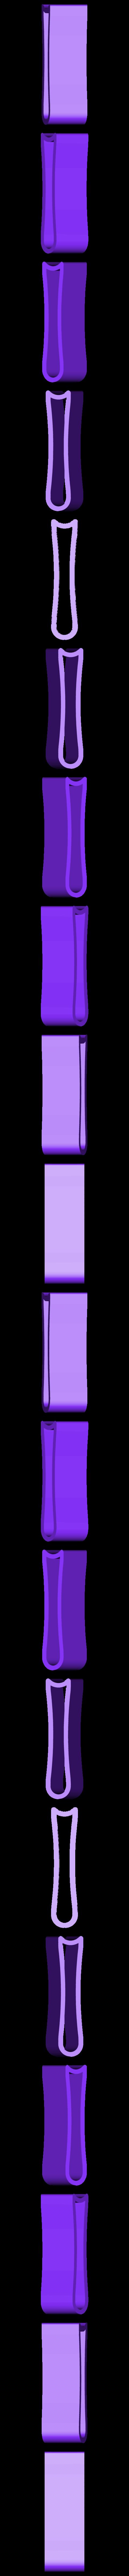 C1_X3.stl Download STL file Adjustable lamp - with vertebrae  • 3D printable object, Ciokobango